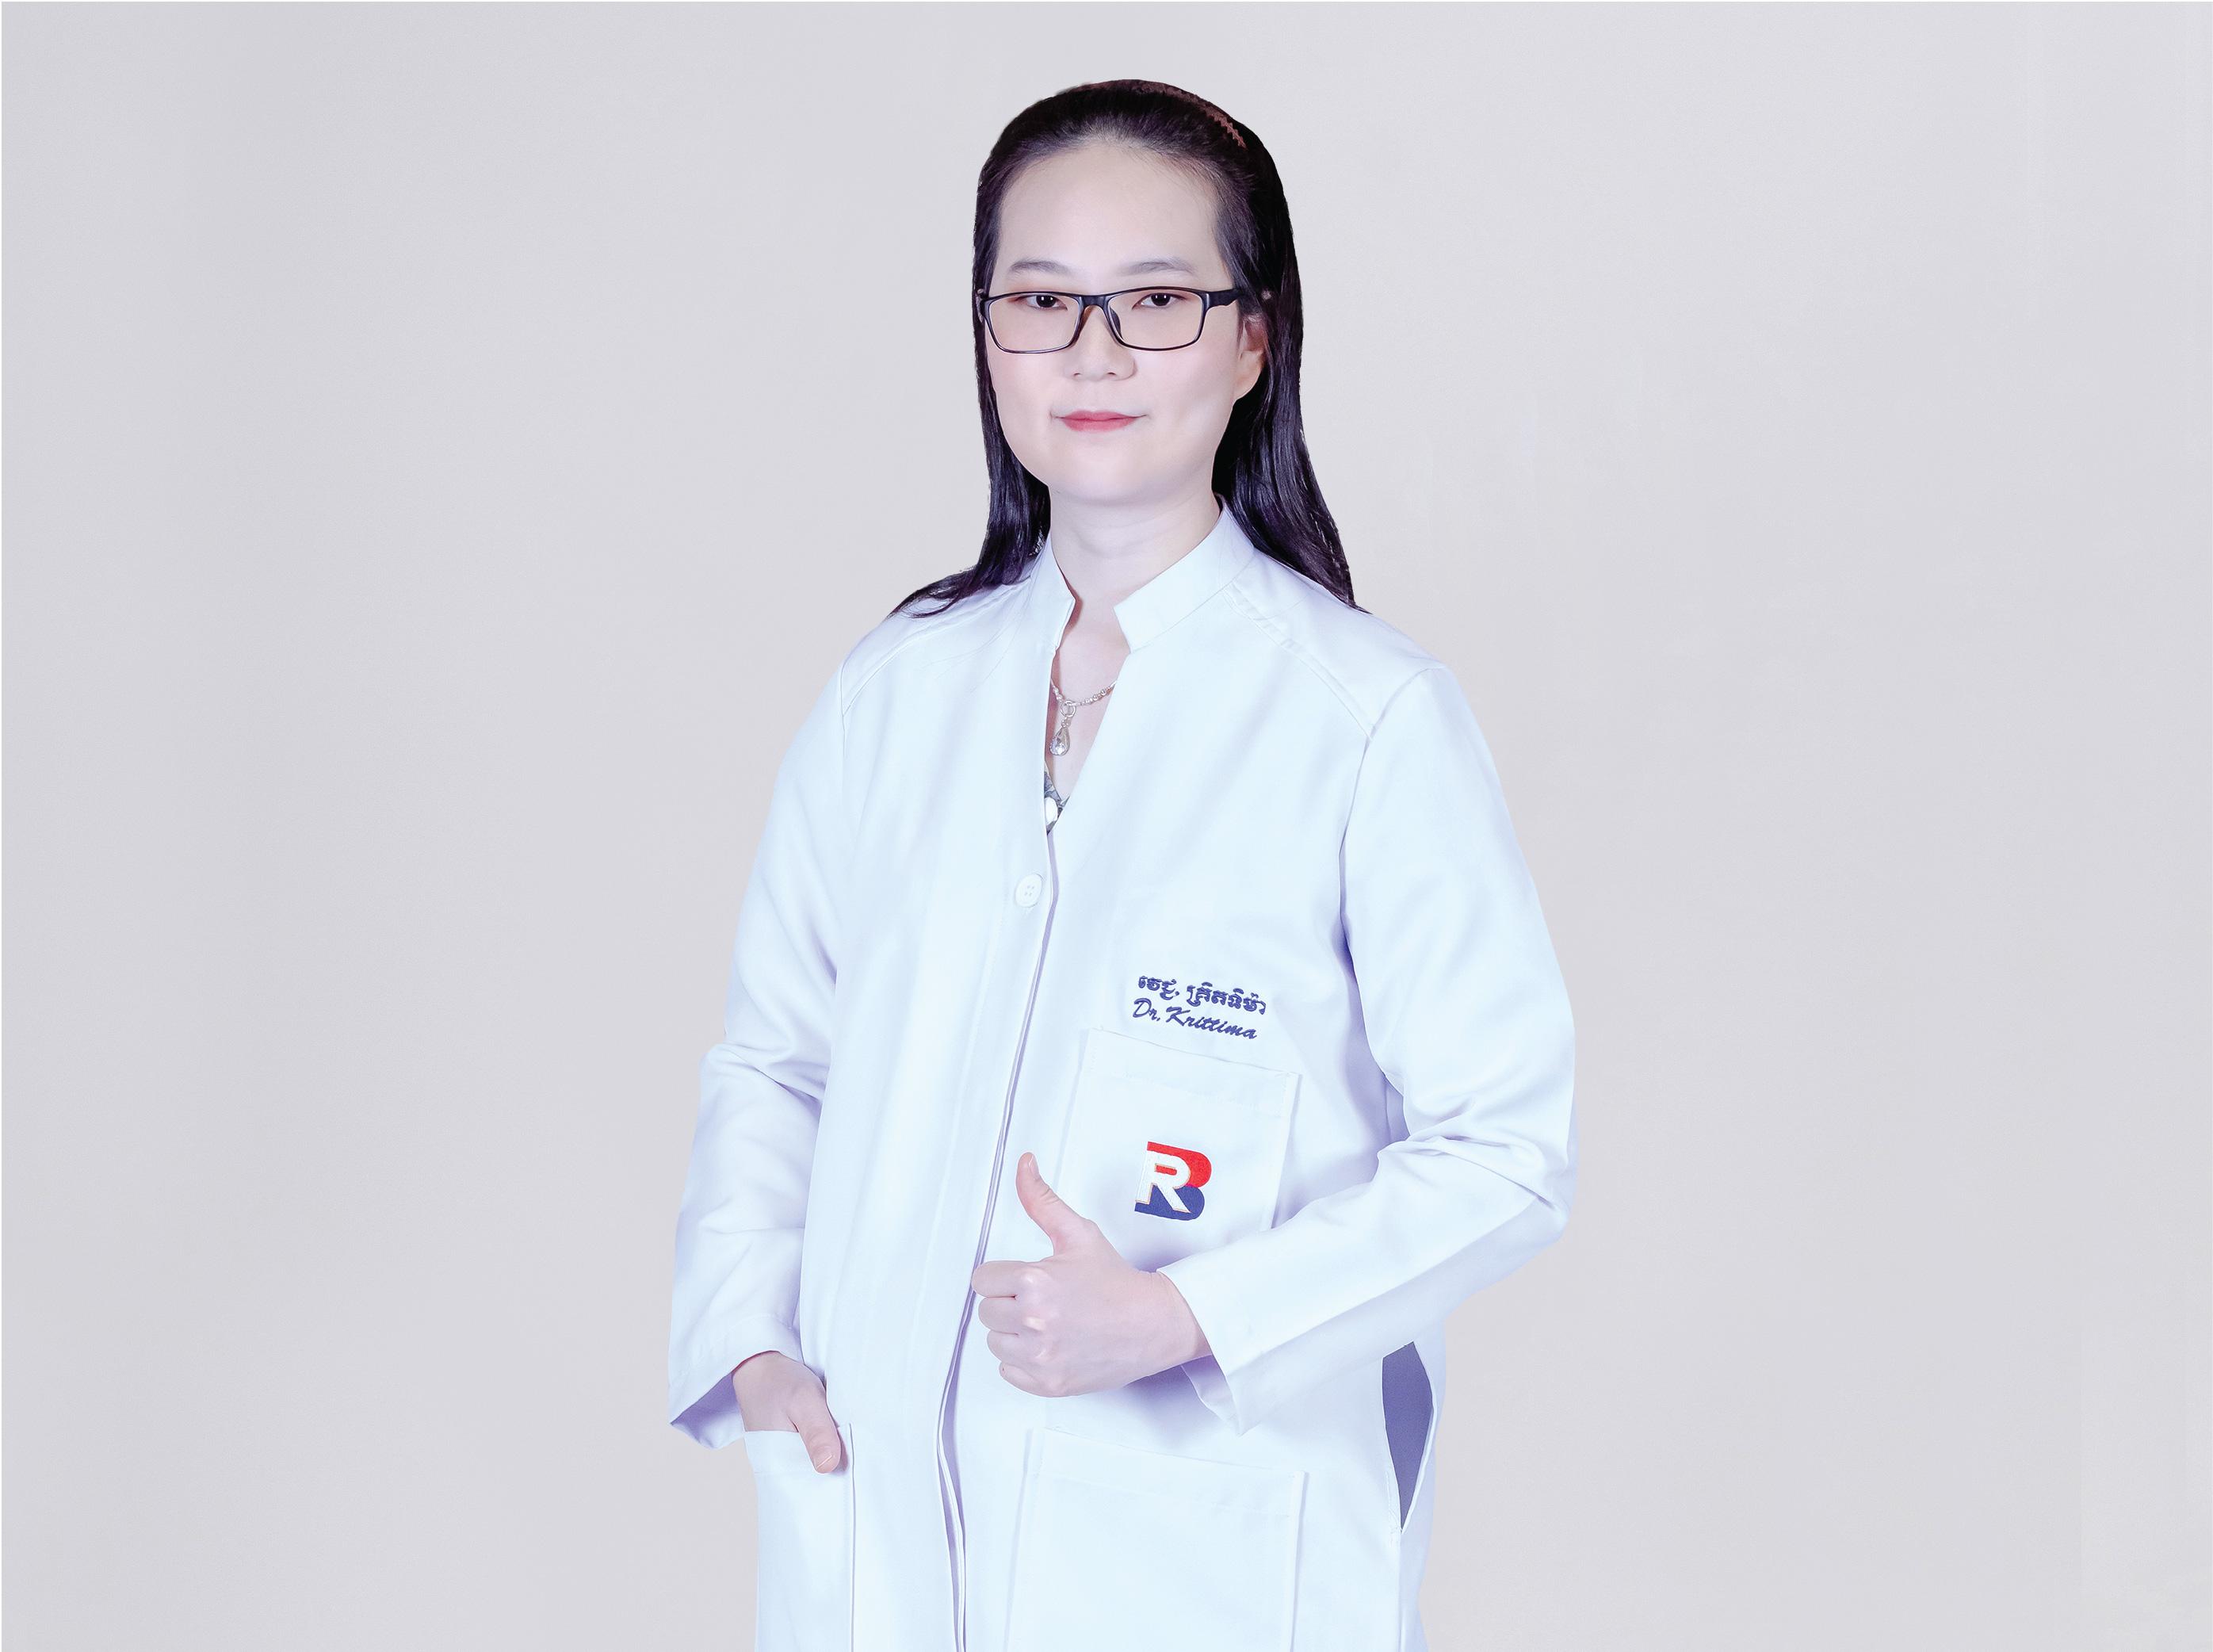 Dr. Krittima Laophannarai